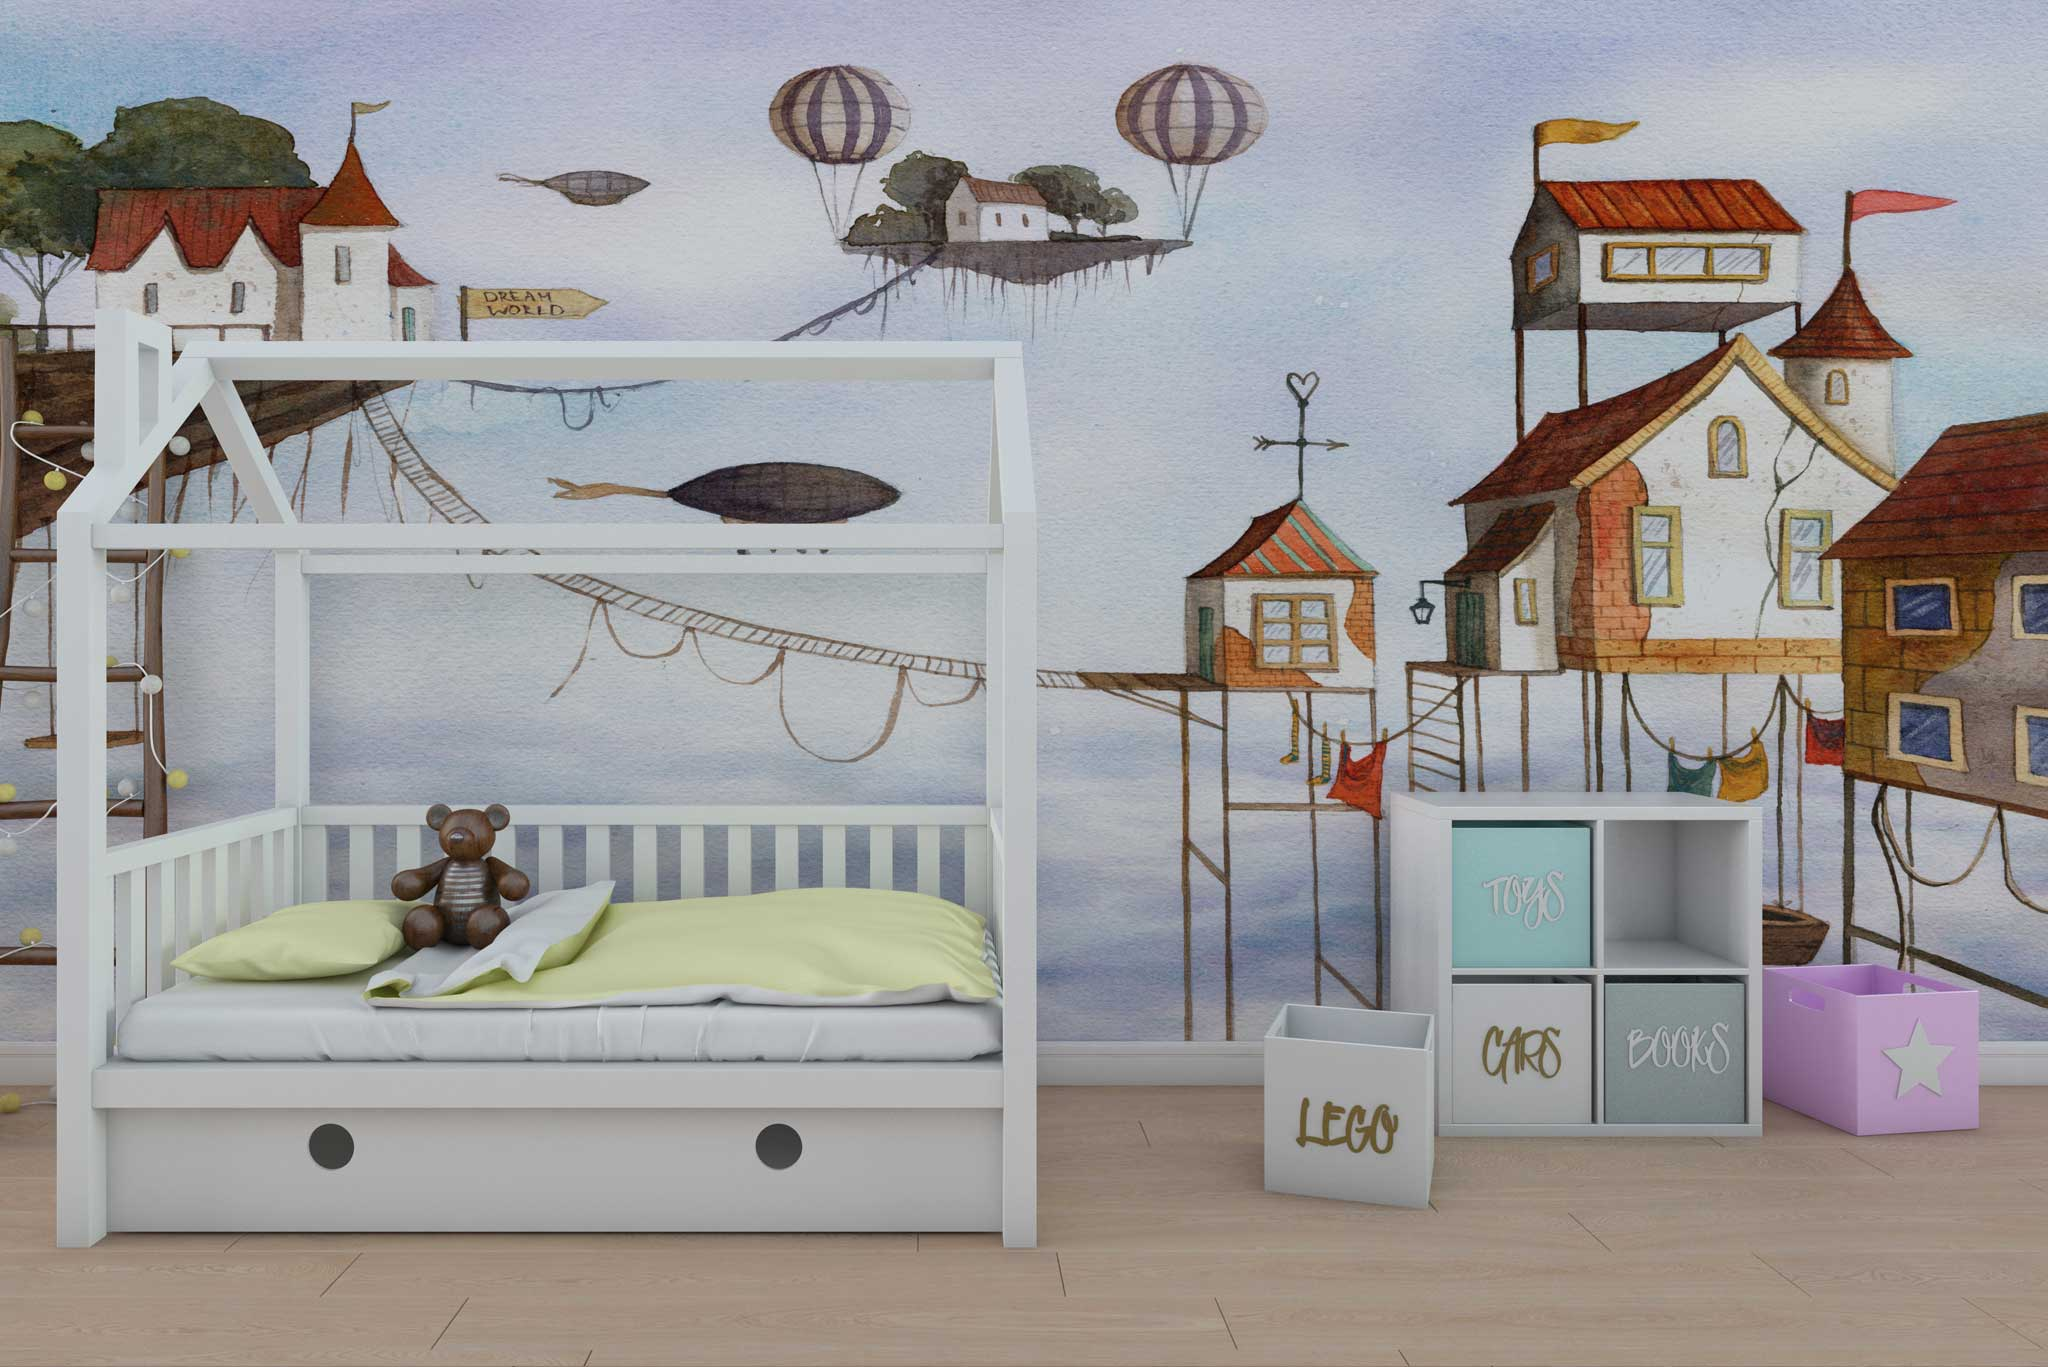 https://daringprints.ro/wp-content/uploads/2020/12/taoet-fototapet-special-personalizat-comanda-bucuresti-camera-dormitor-copii-perete-pat-design-interior-case-casute-poveste-fantastic-imaginatie-calatorie.jpg